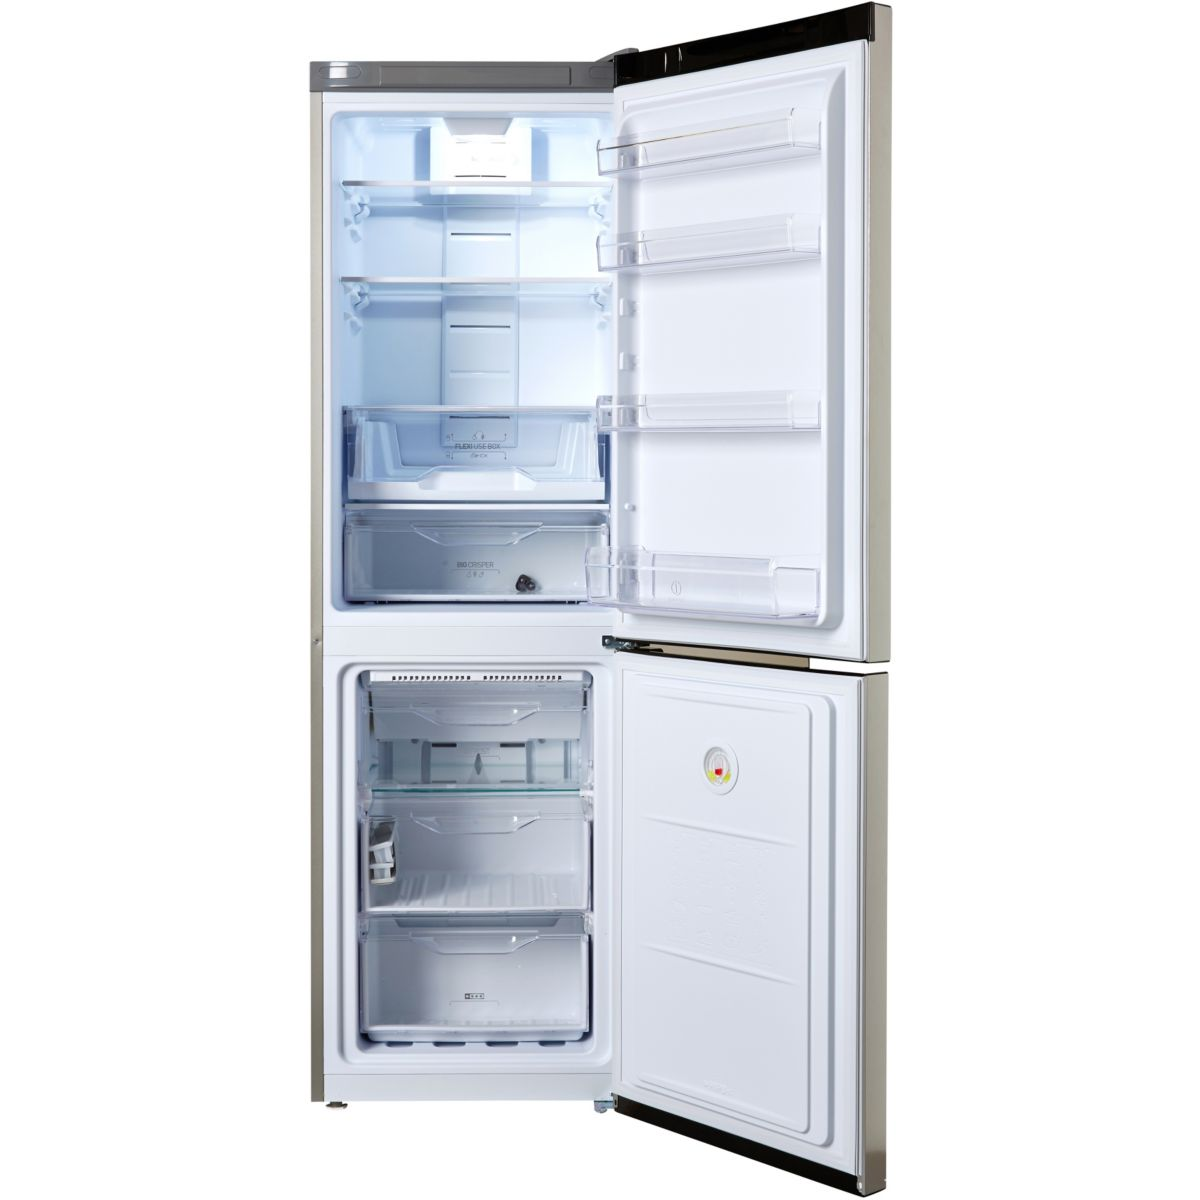 rfrigrateur conglateur 55 cm largeur froid ventil affordable gallery of congelateur froid. Black Bedroom Furniture Sets. Home Design Ideas